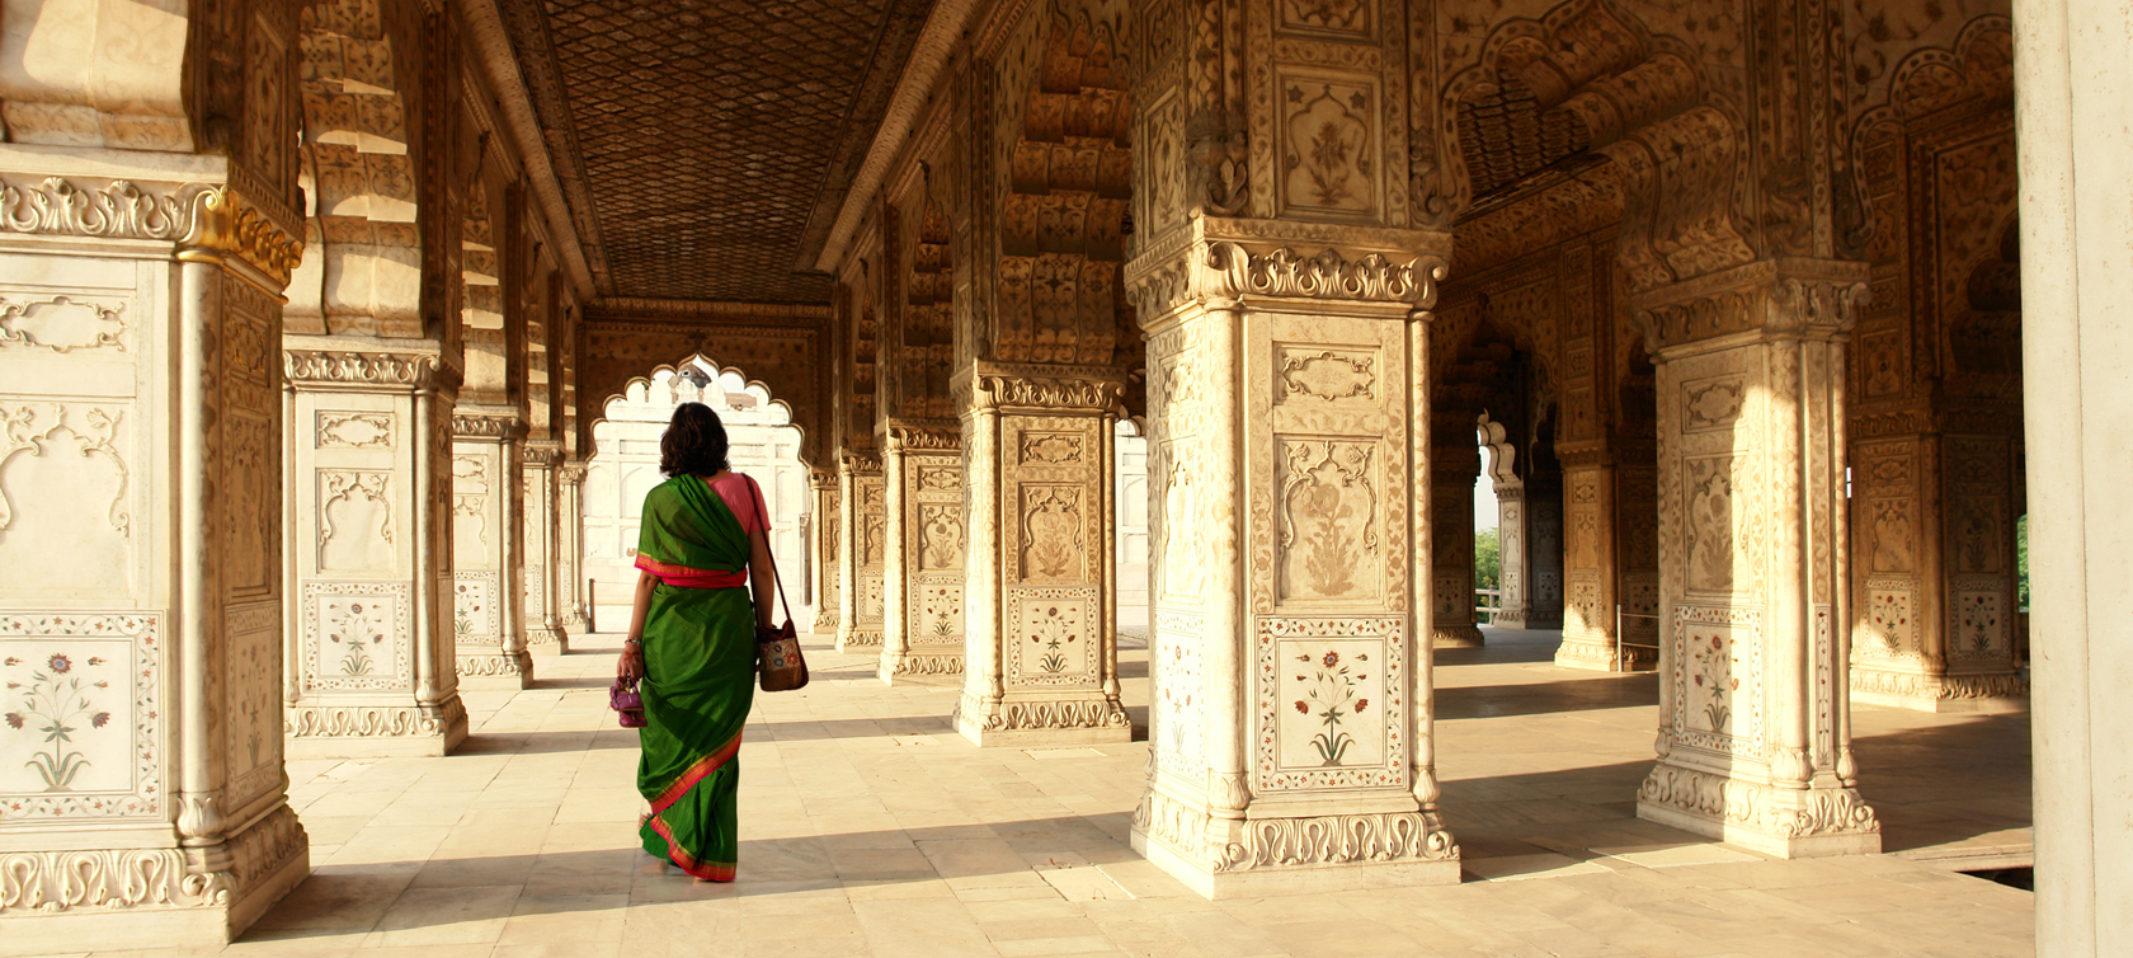 John's Top 6 Journeys Through the Indian Subcontinent thumbnail image